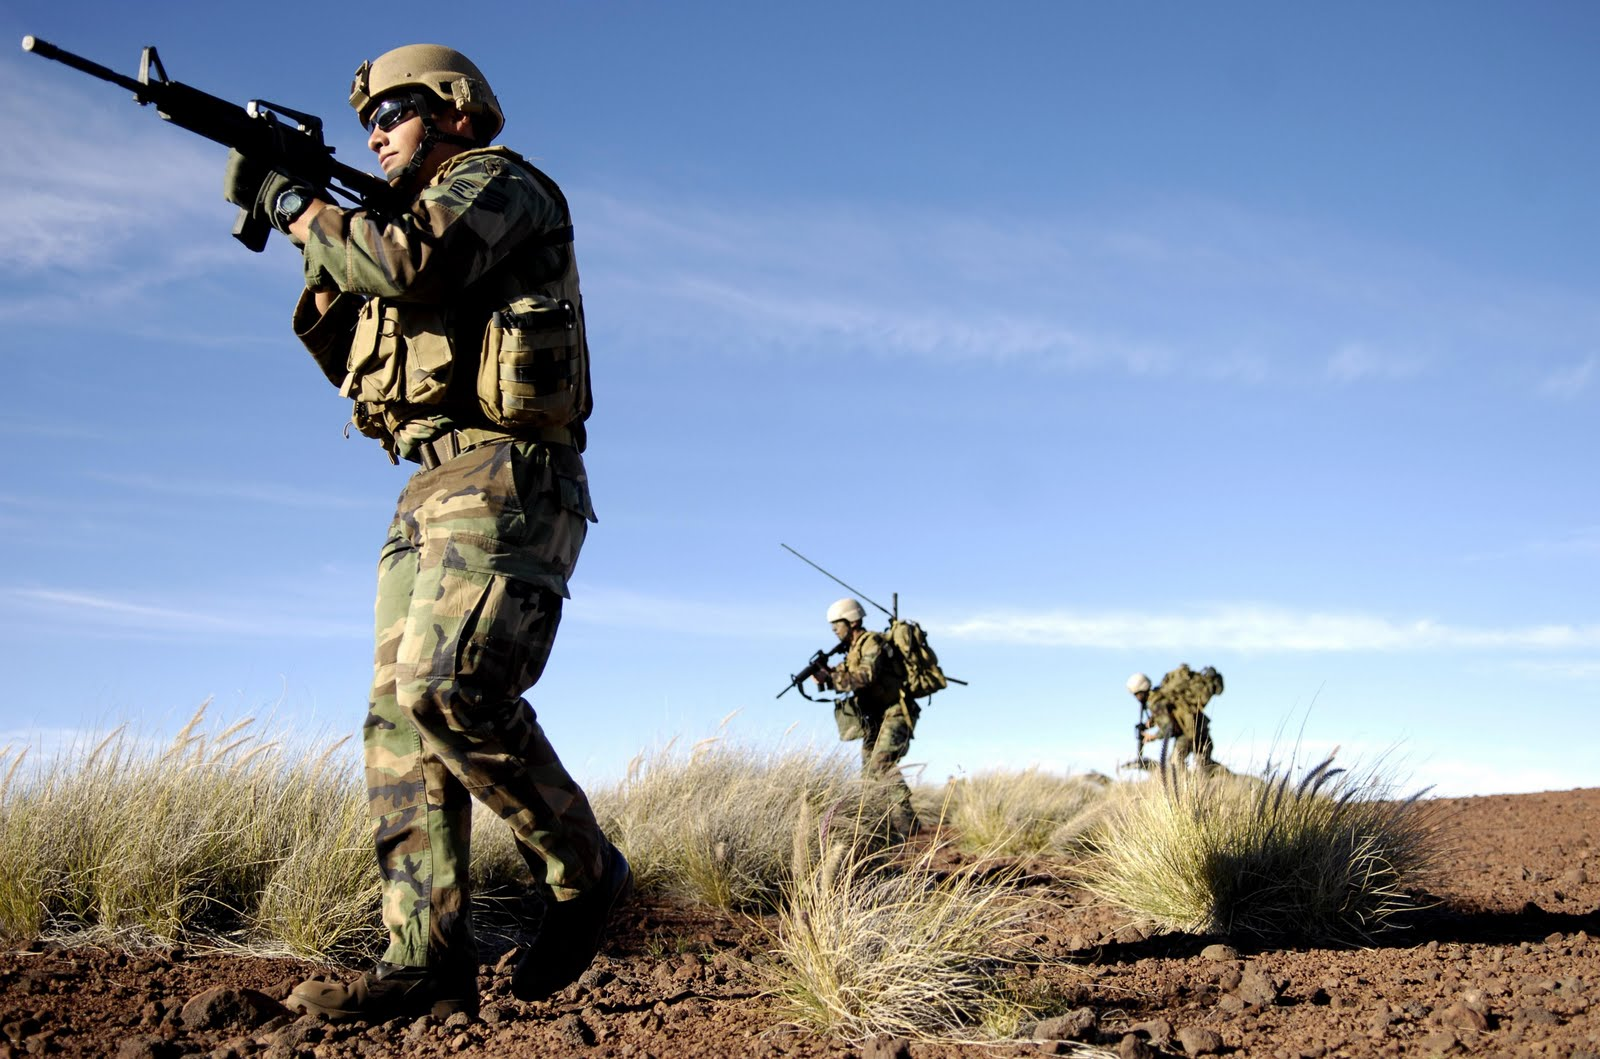 Free Wallpaper Dekstop: Army Military HD Wallpapers, Army hd wallpapers